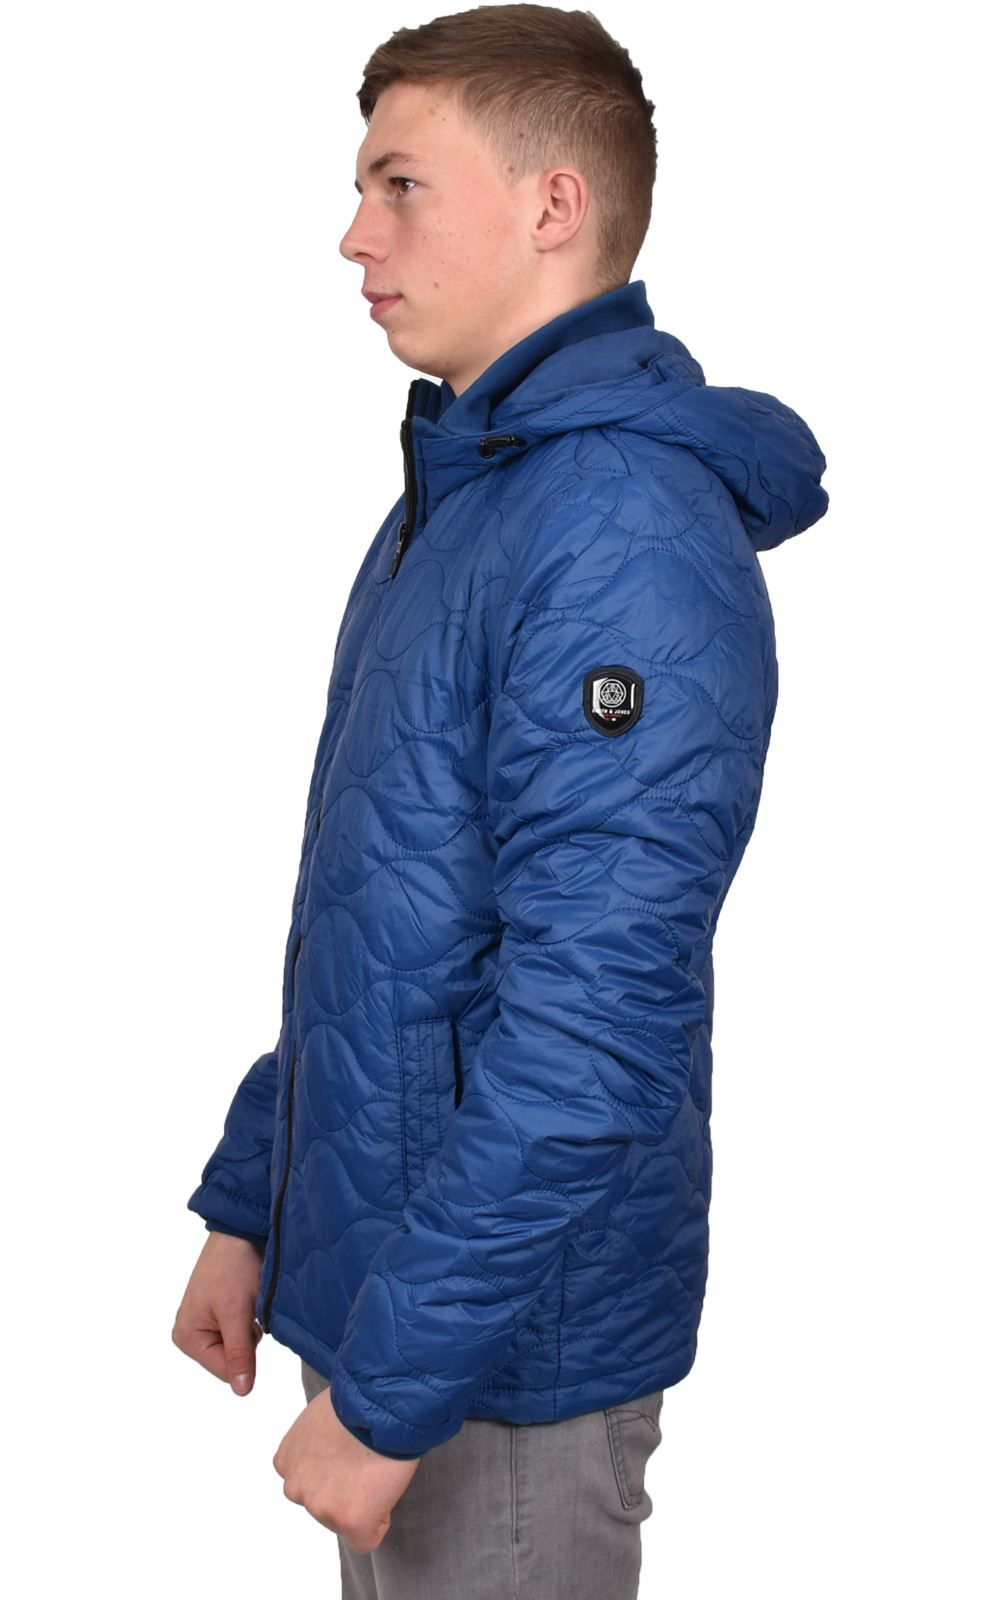 Mens-Smith-amp-Jones-Jacket-Full-Zip-Fleece-Lined-Hooded-Light-Weight-Warm-Coat thumbnail 10